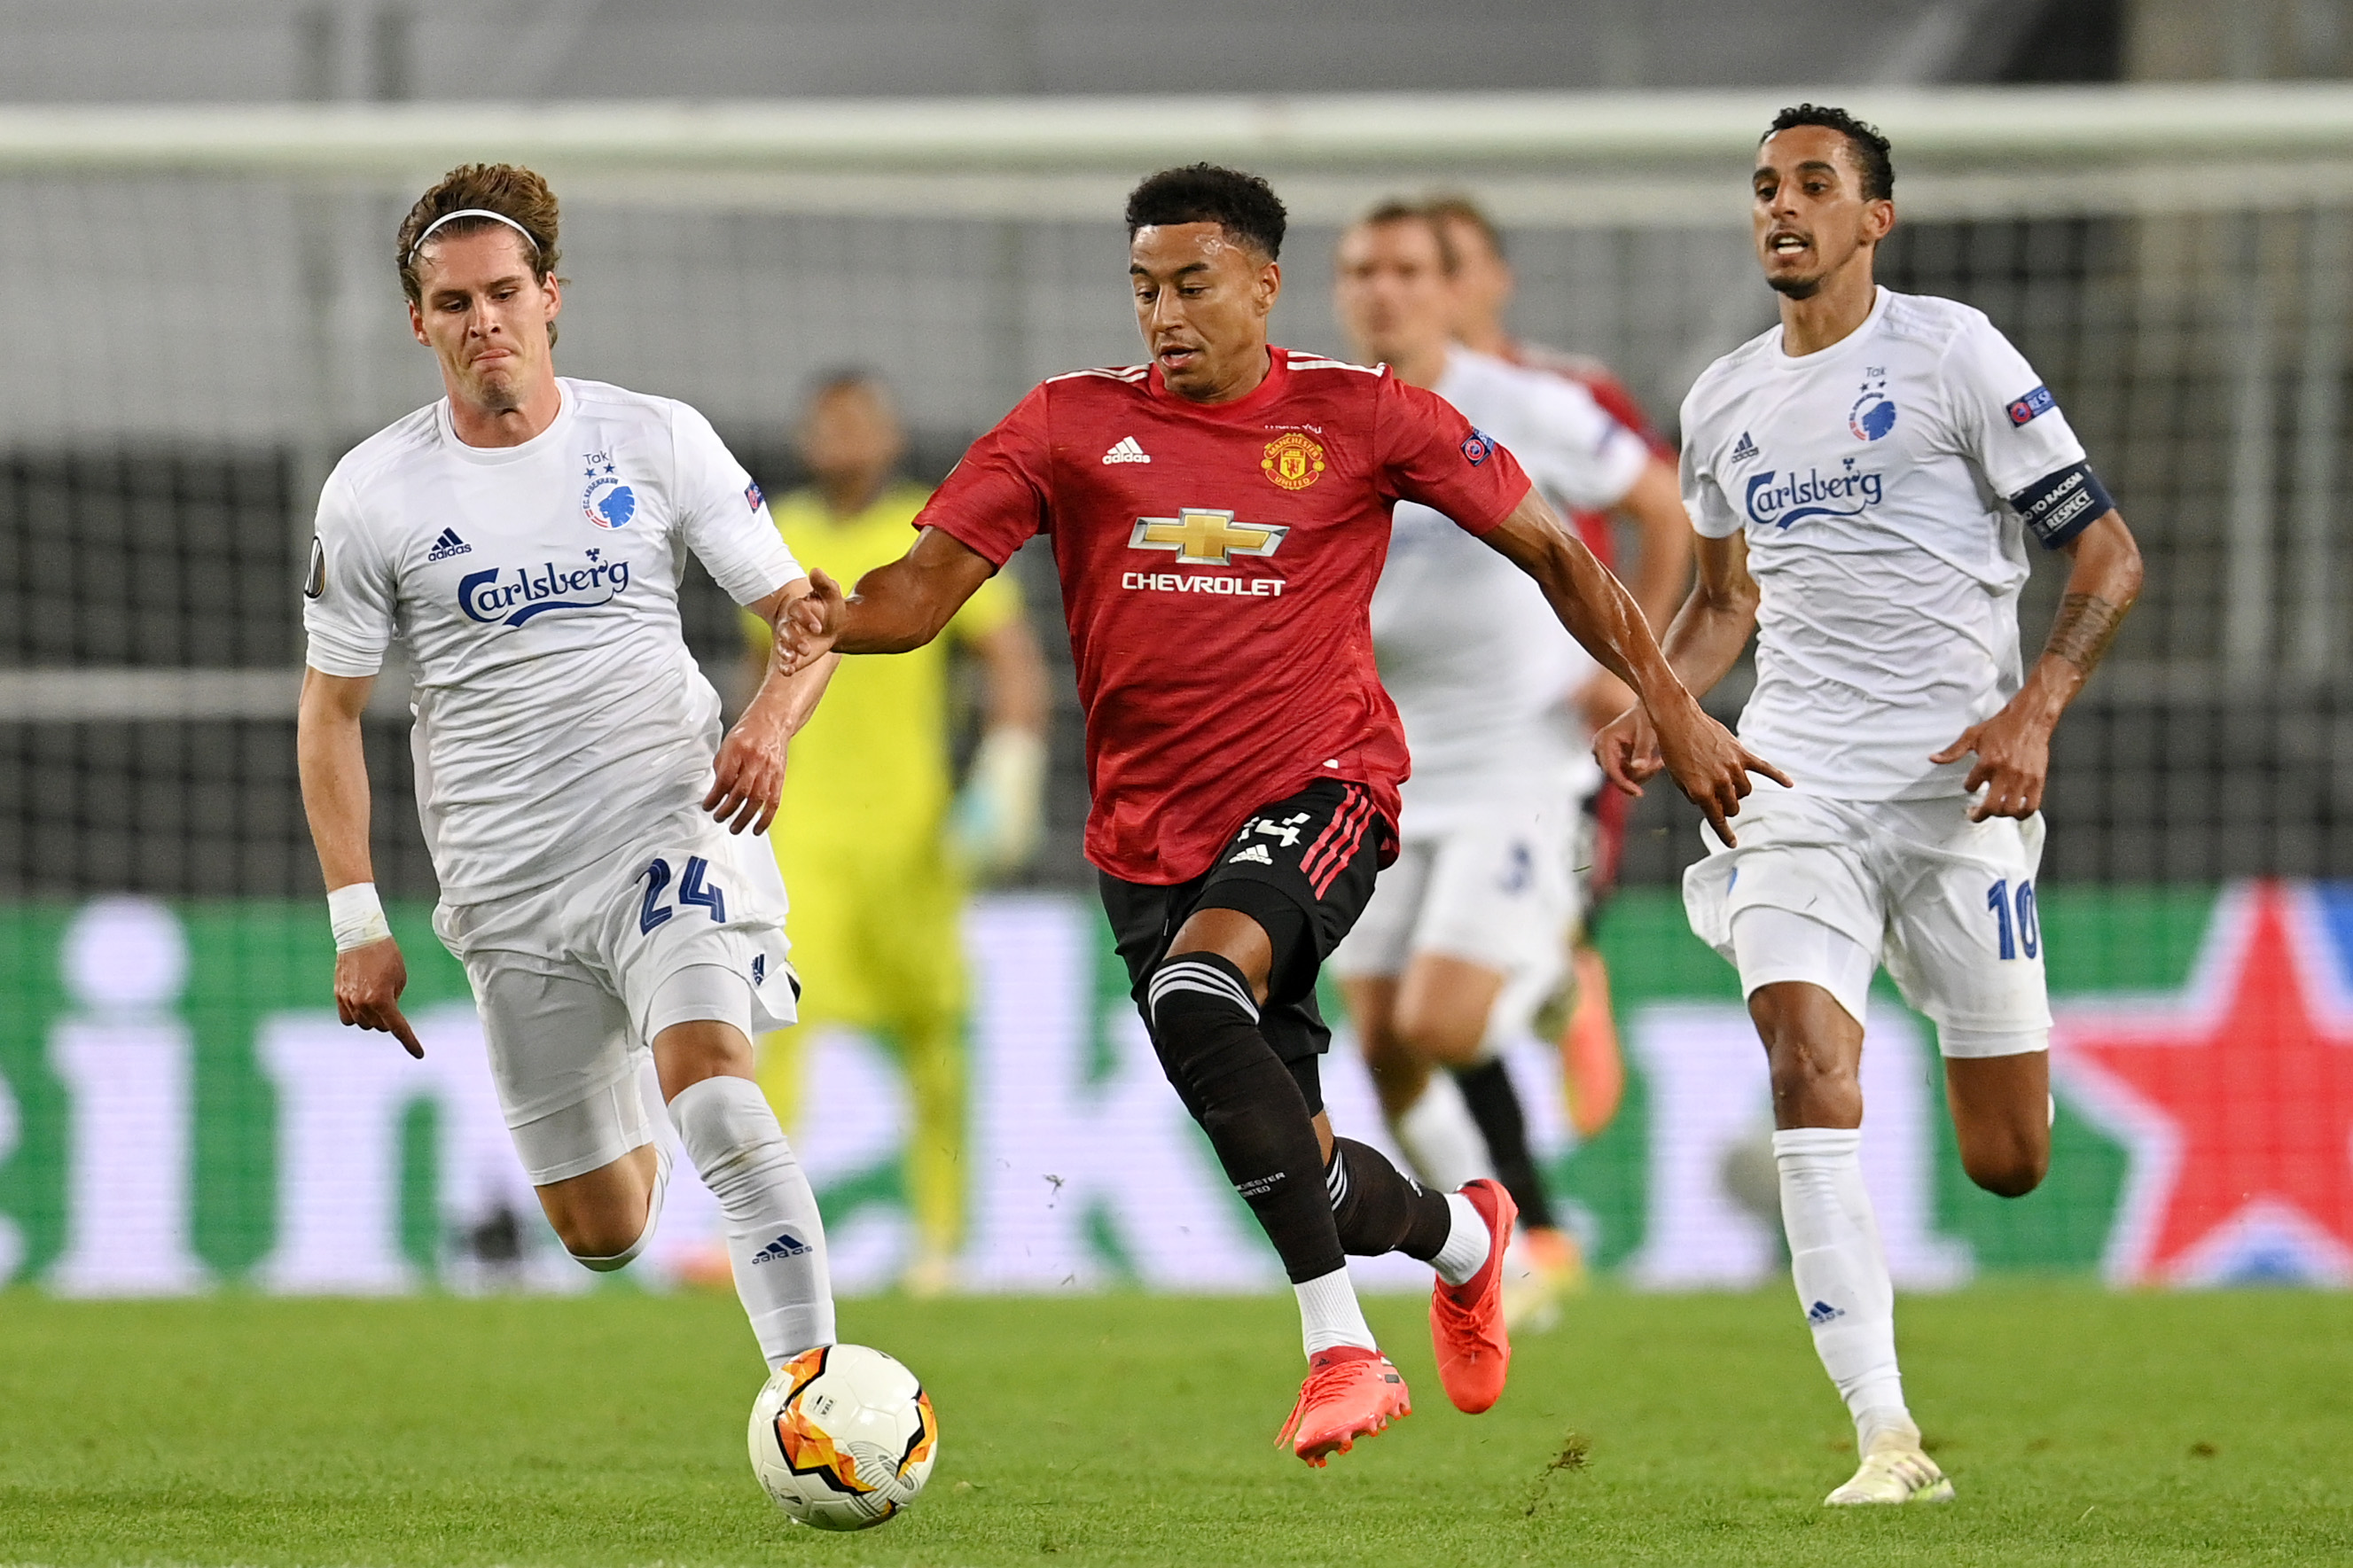 Soi kèo Manchester Utd vs FC Copenhagen lúc 2h ngày 11/8 ...  |Man Utd-fc Copenhaga